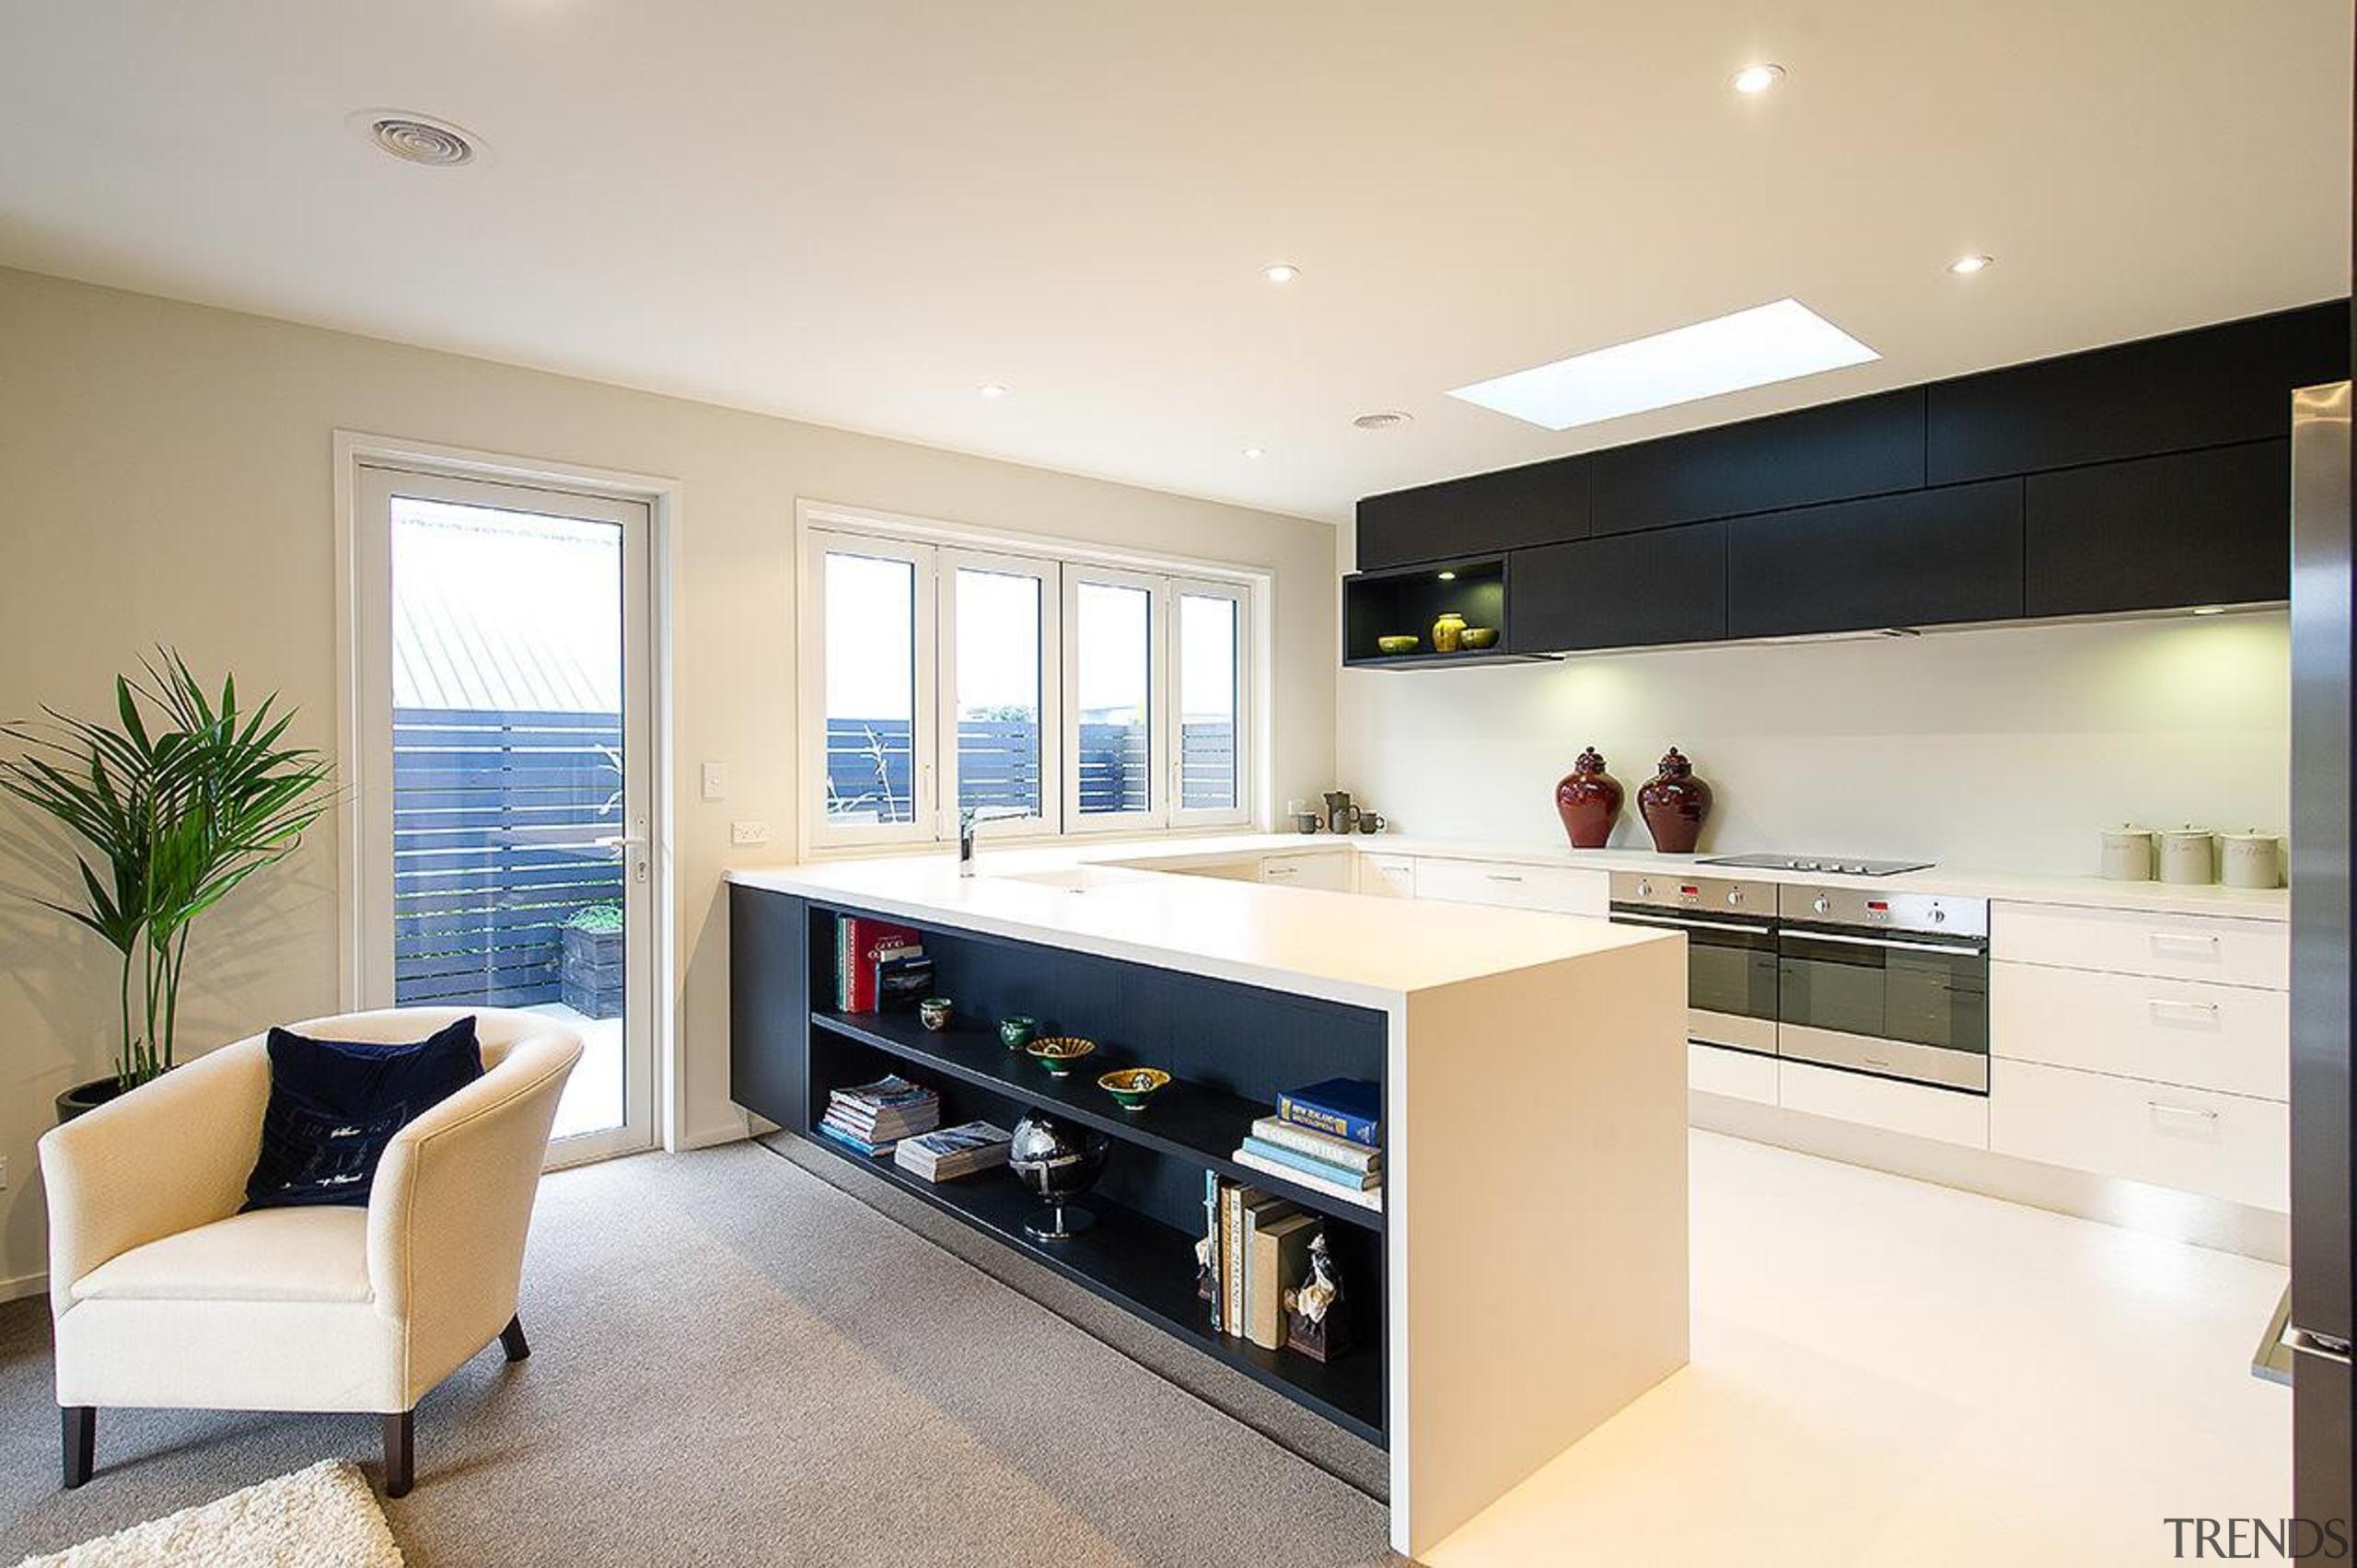 For more information, please visit www.gjgardner.co.nz countertop, interior design, kitchen, real estate, room, white